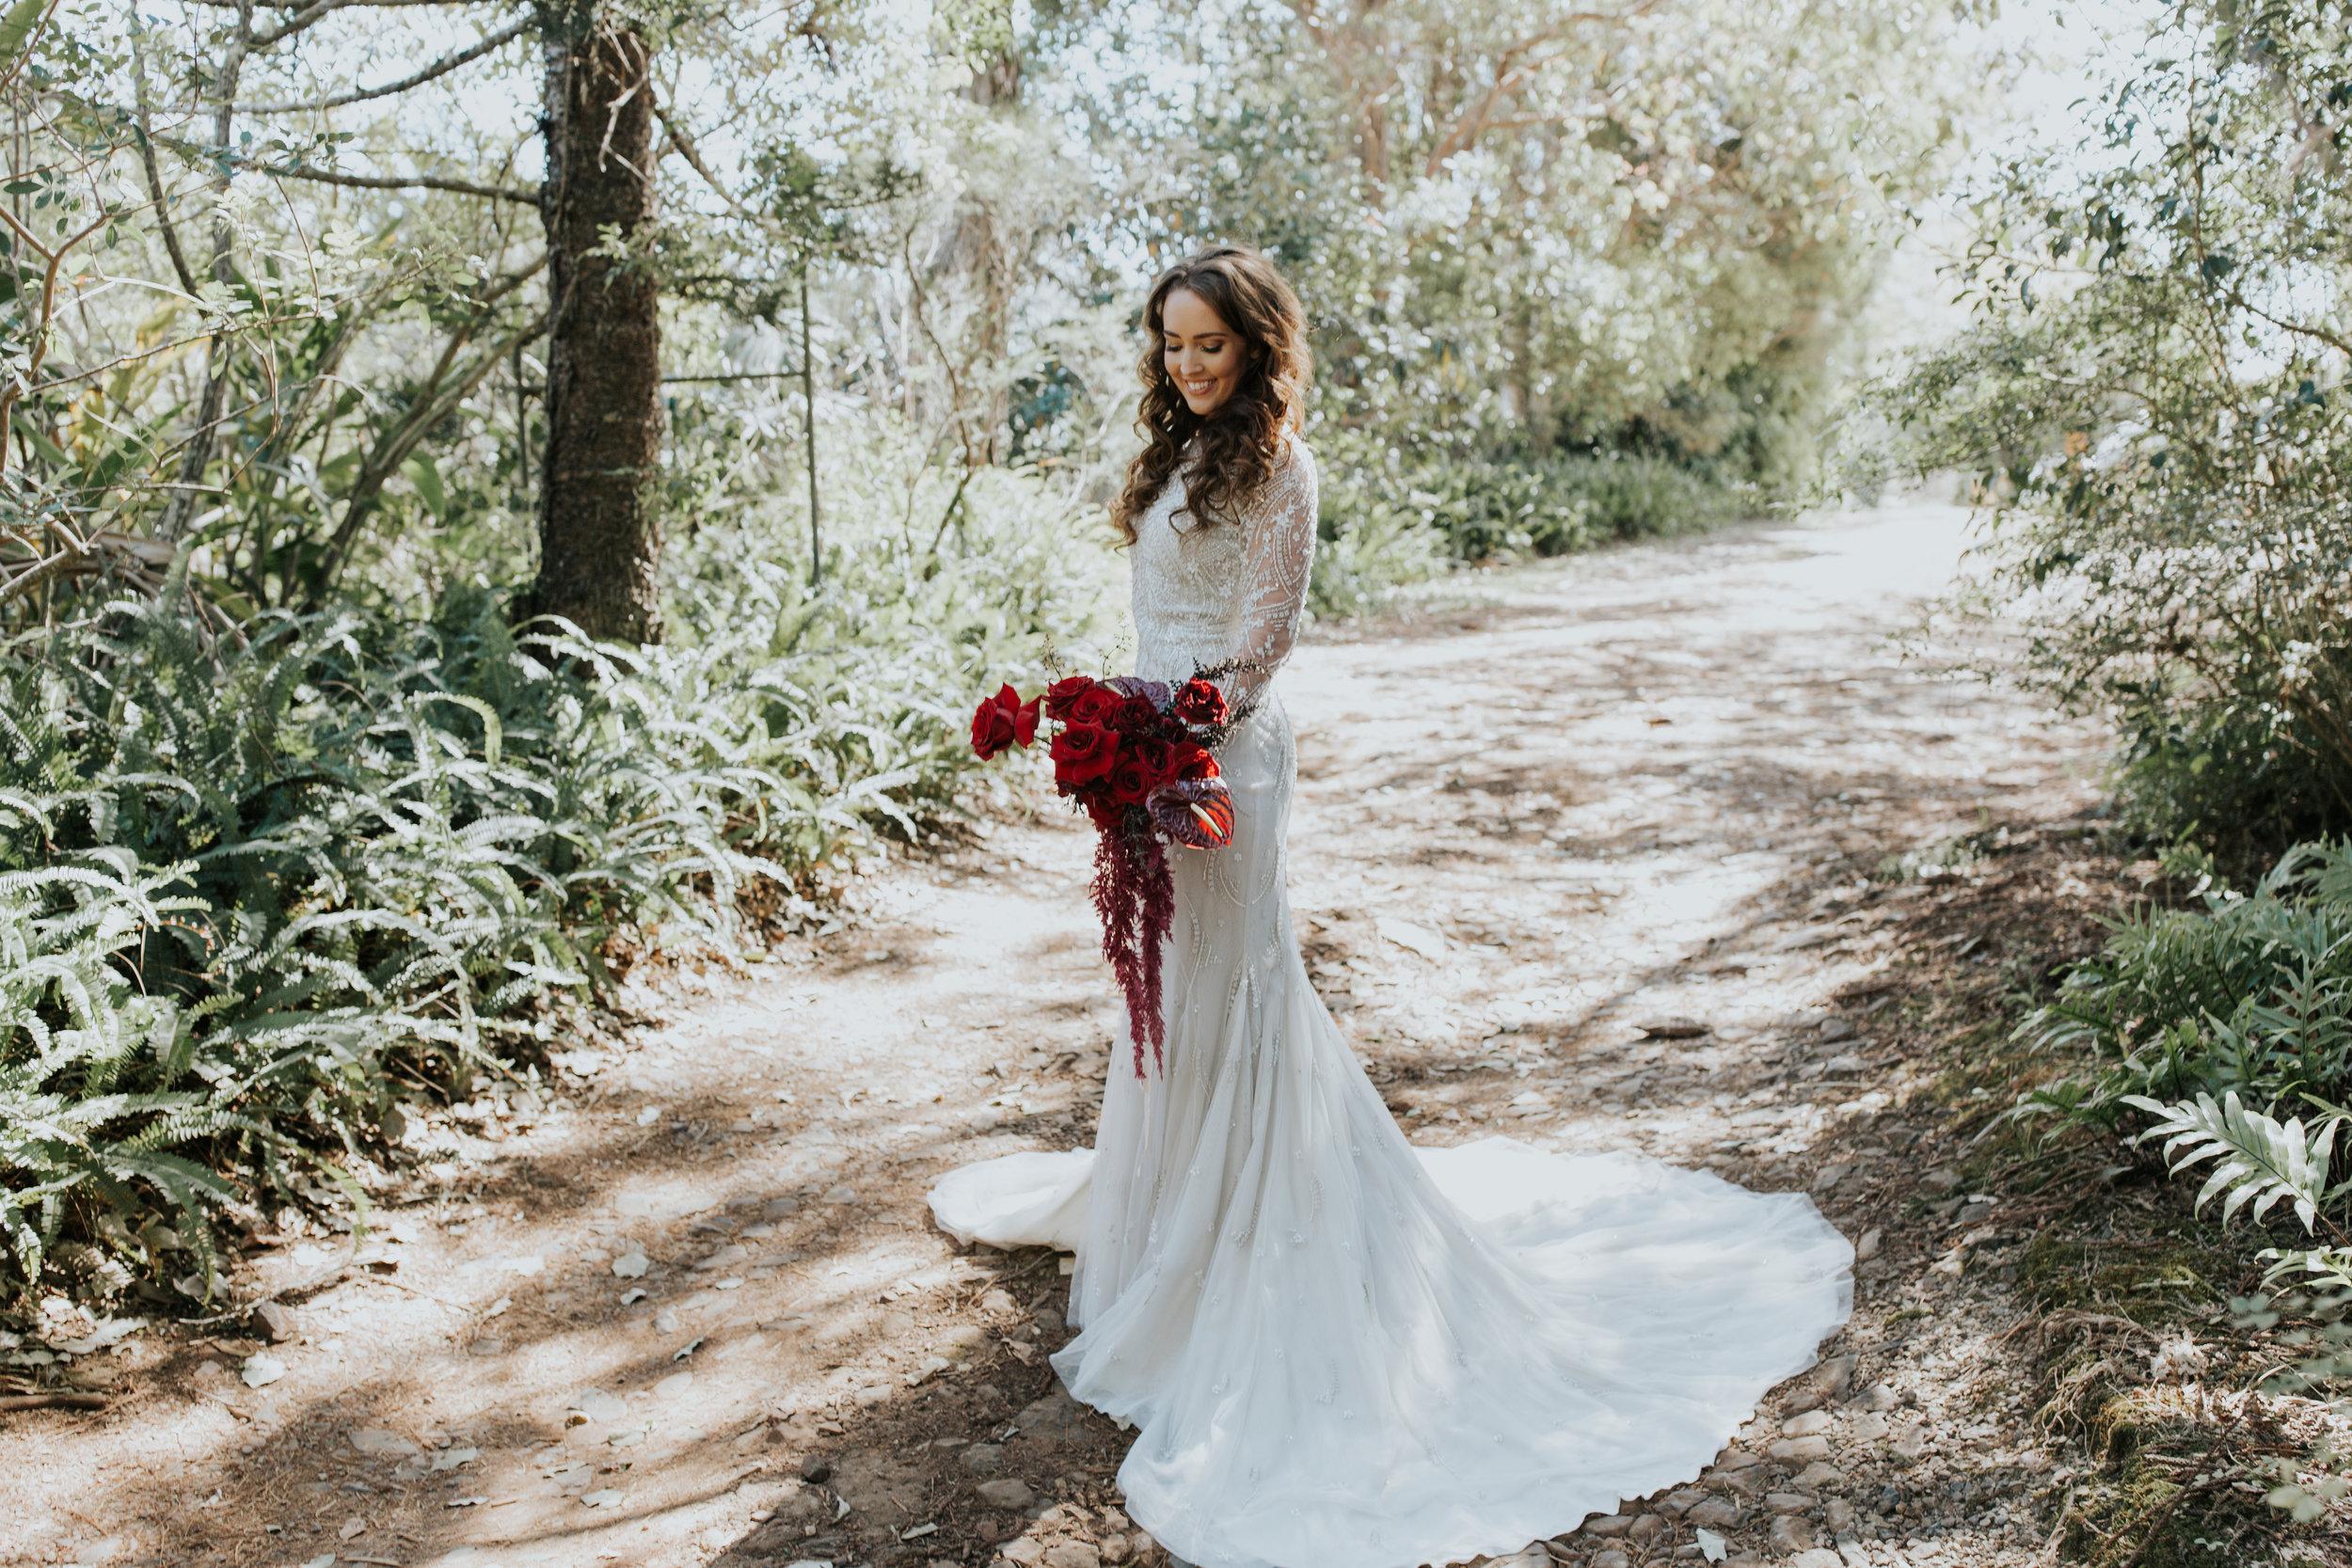 Bloodwood Botanica | Red Bridal Bouquet noosa sunshine coast wedding flowers